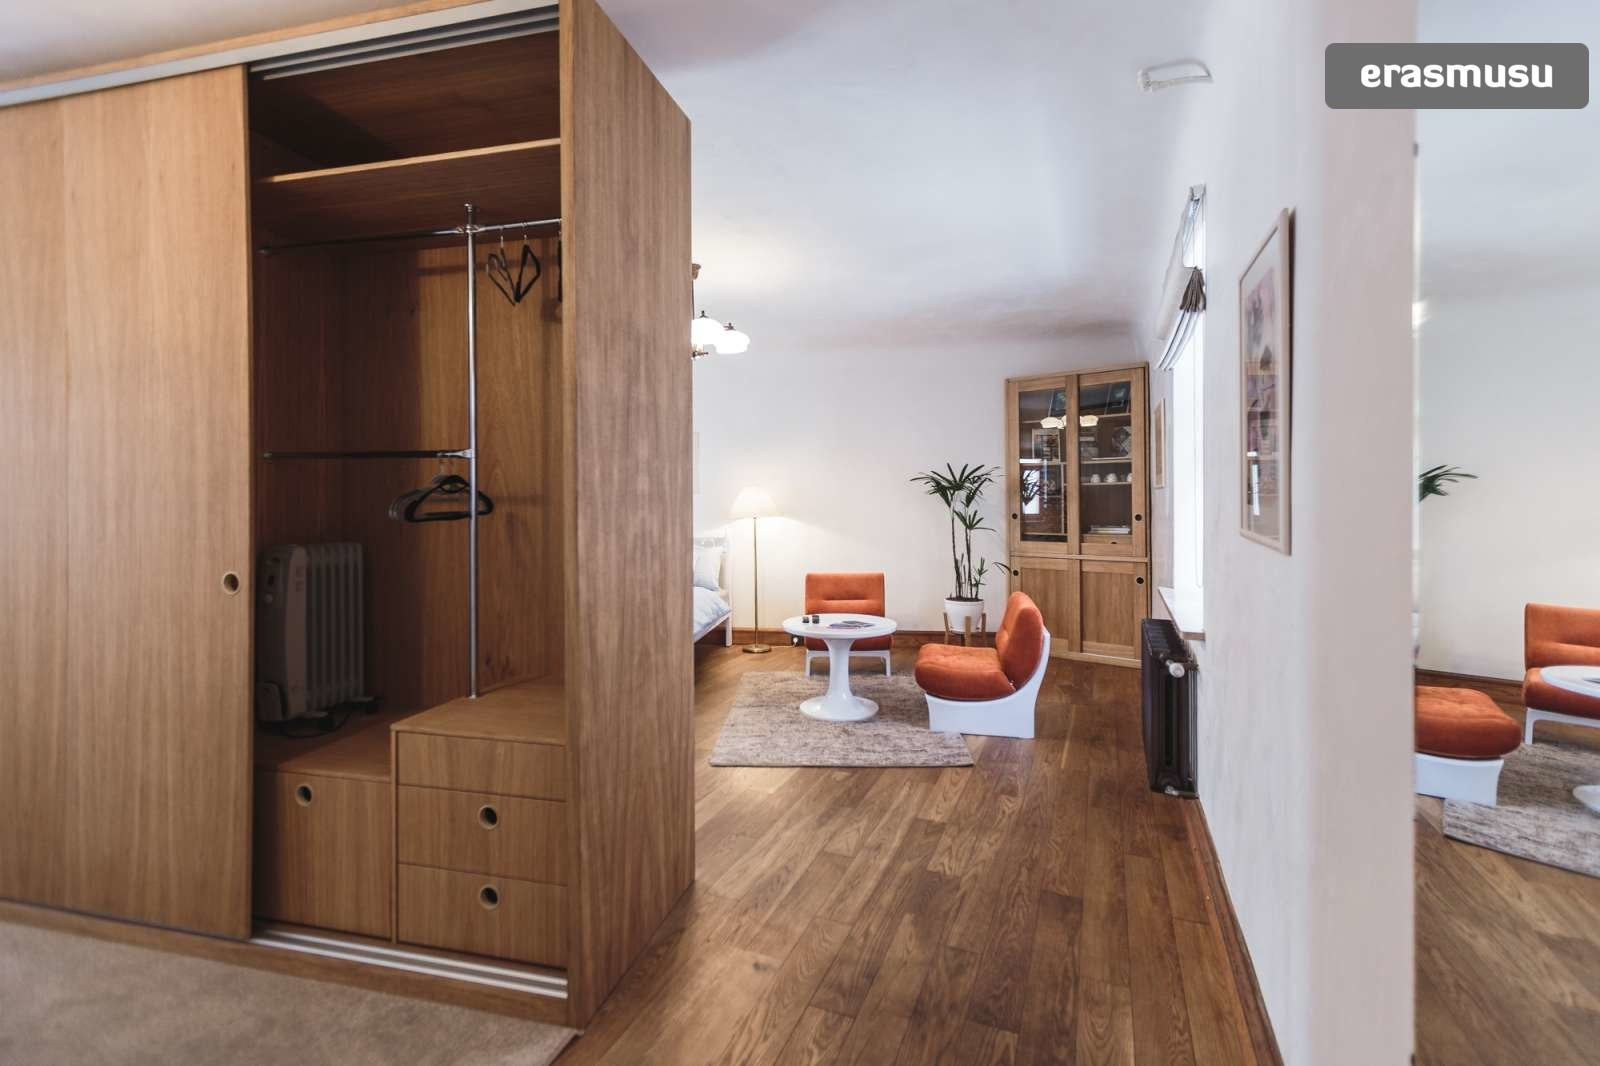 stylish-studio-apartment-rent-vecriga-ca2d897e388febc4c5ef9980ae